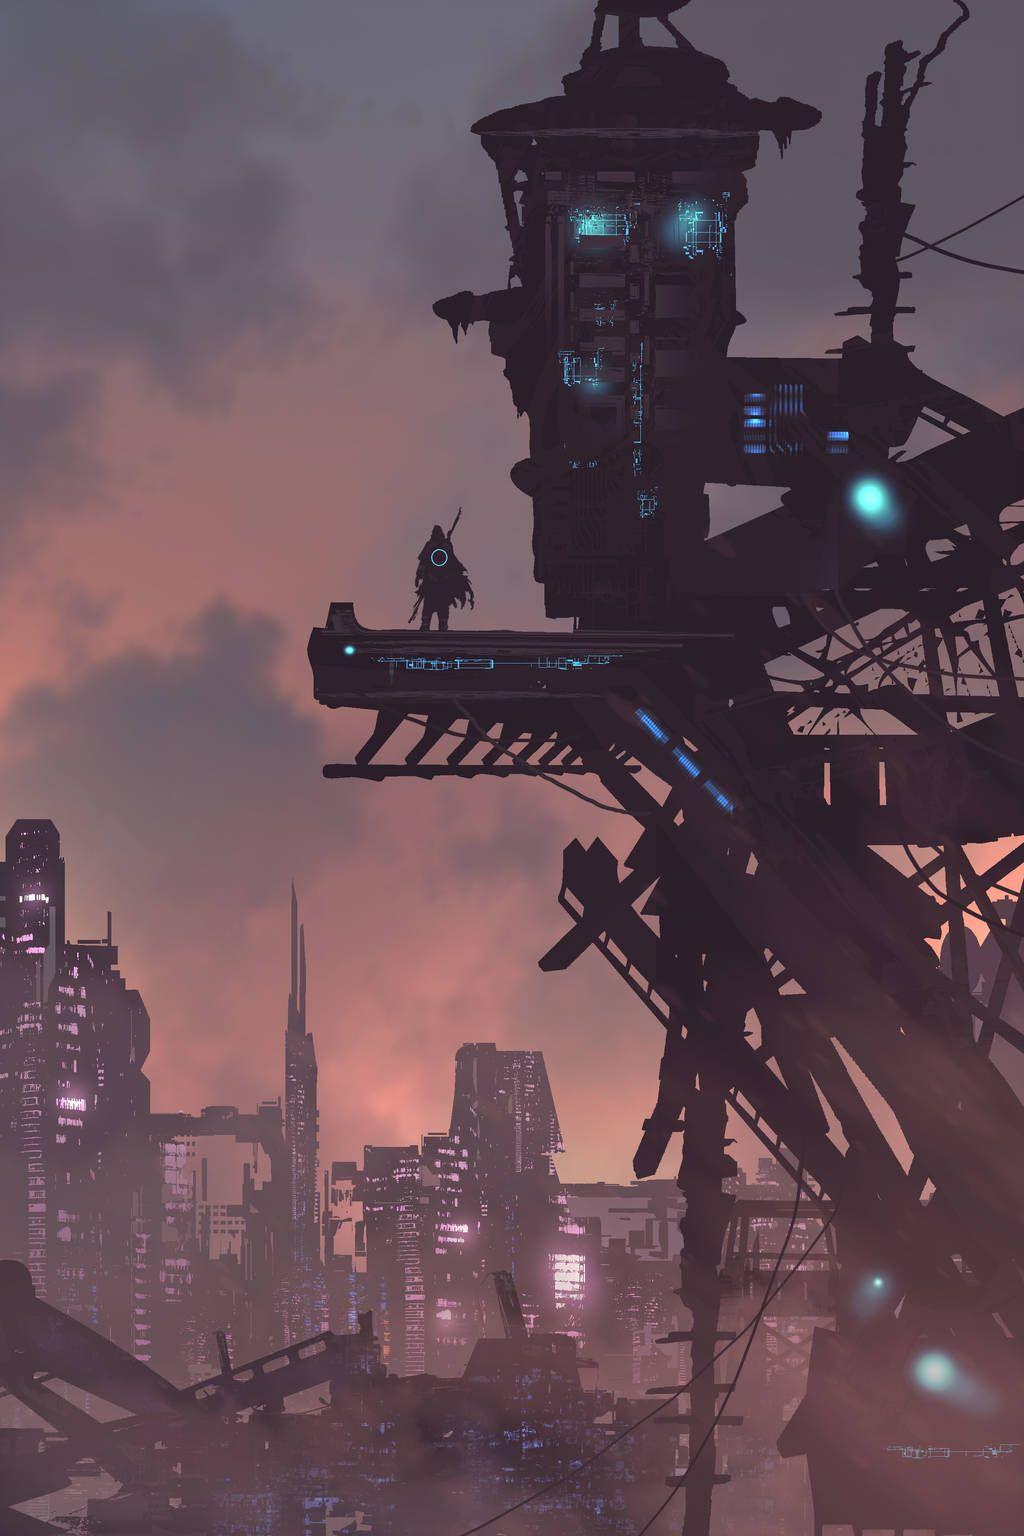 Pin by Delirium Thrash on Cyberpunk | Cyberpunk art ...